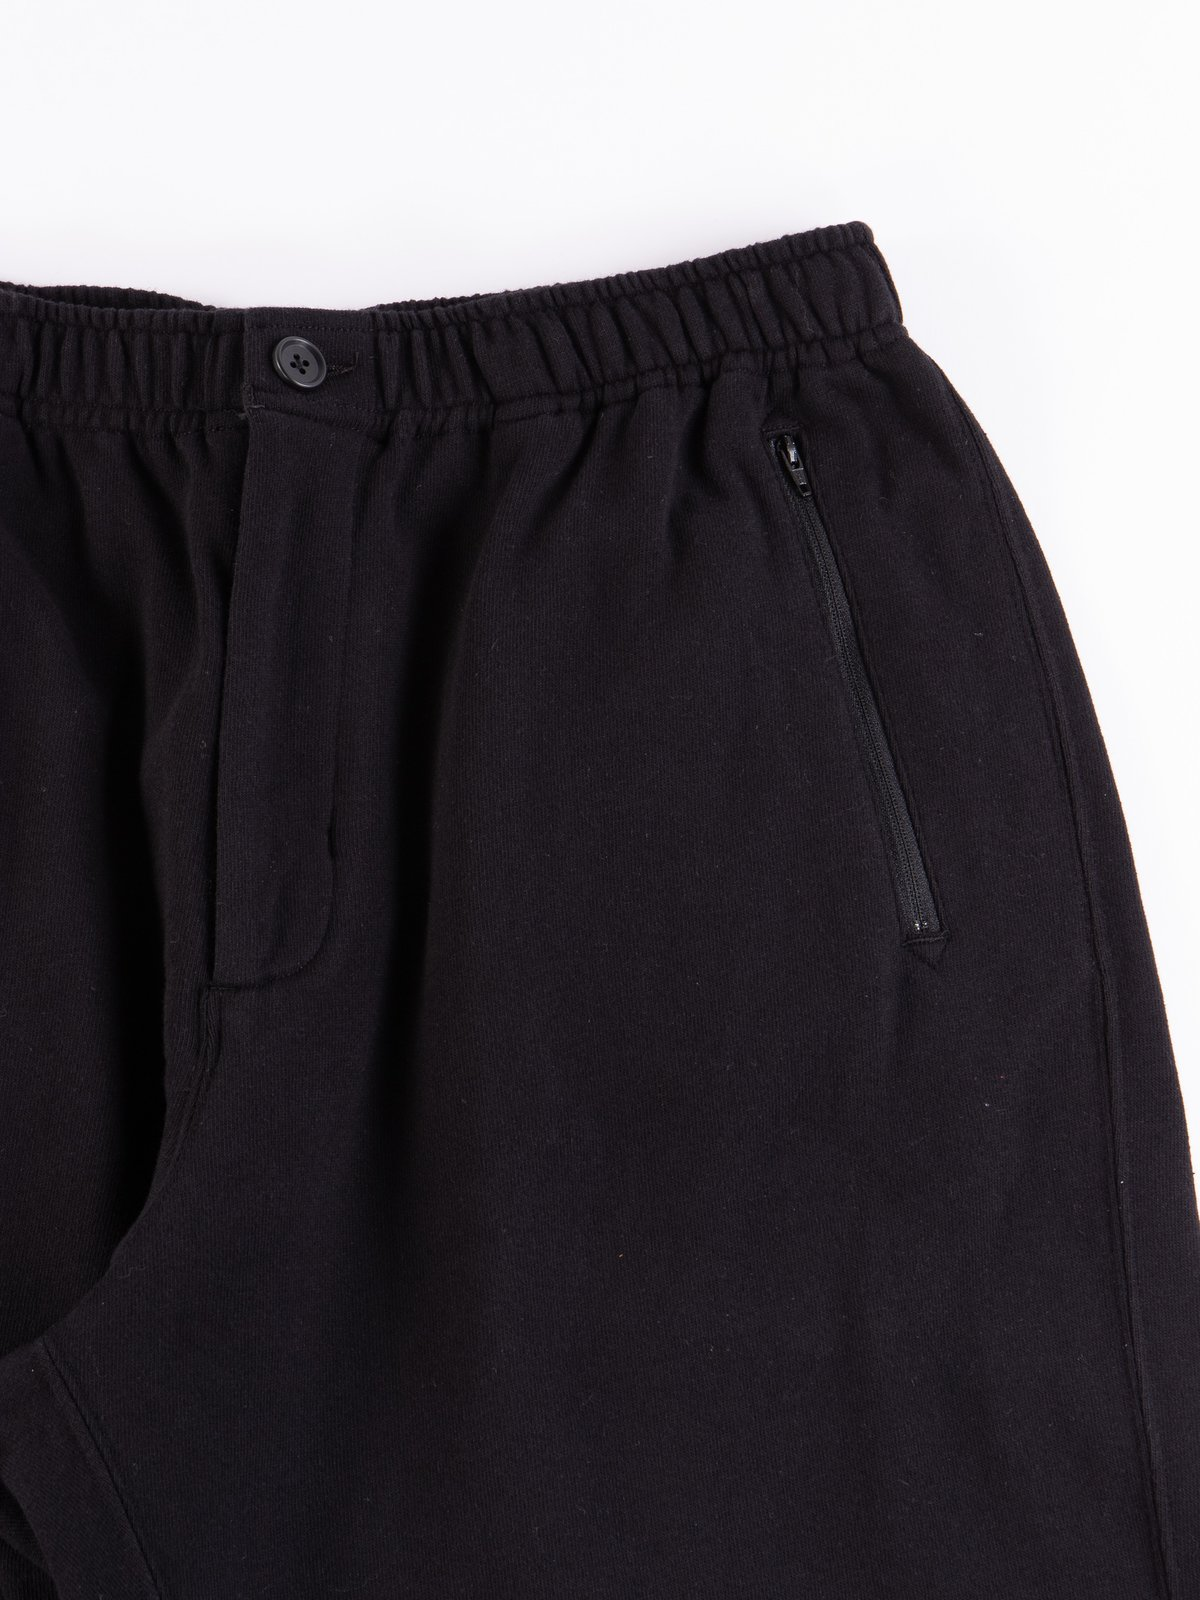 Black Jog Pant - Image 3